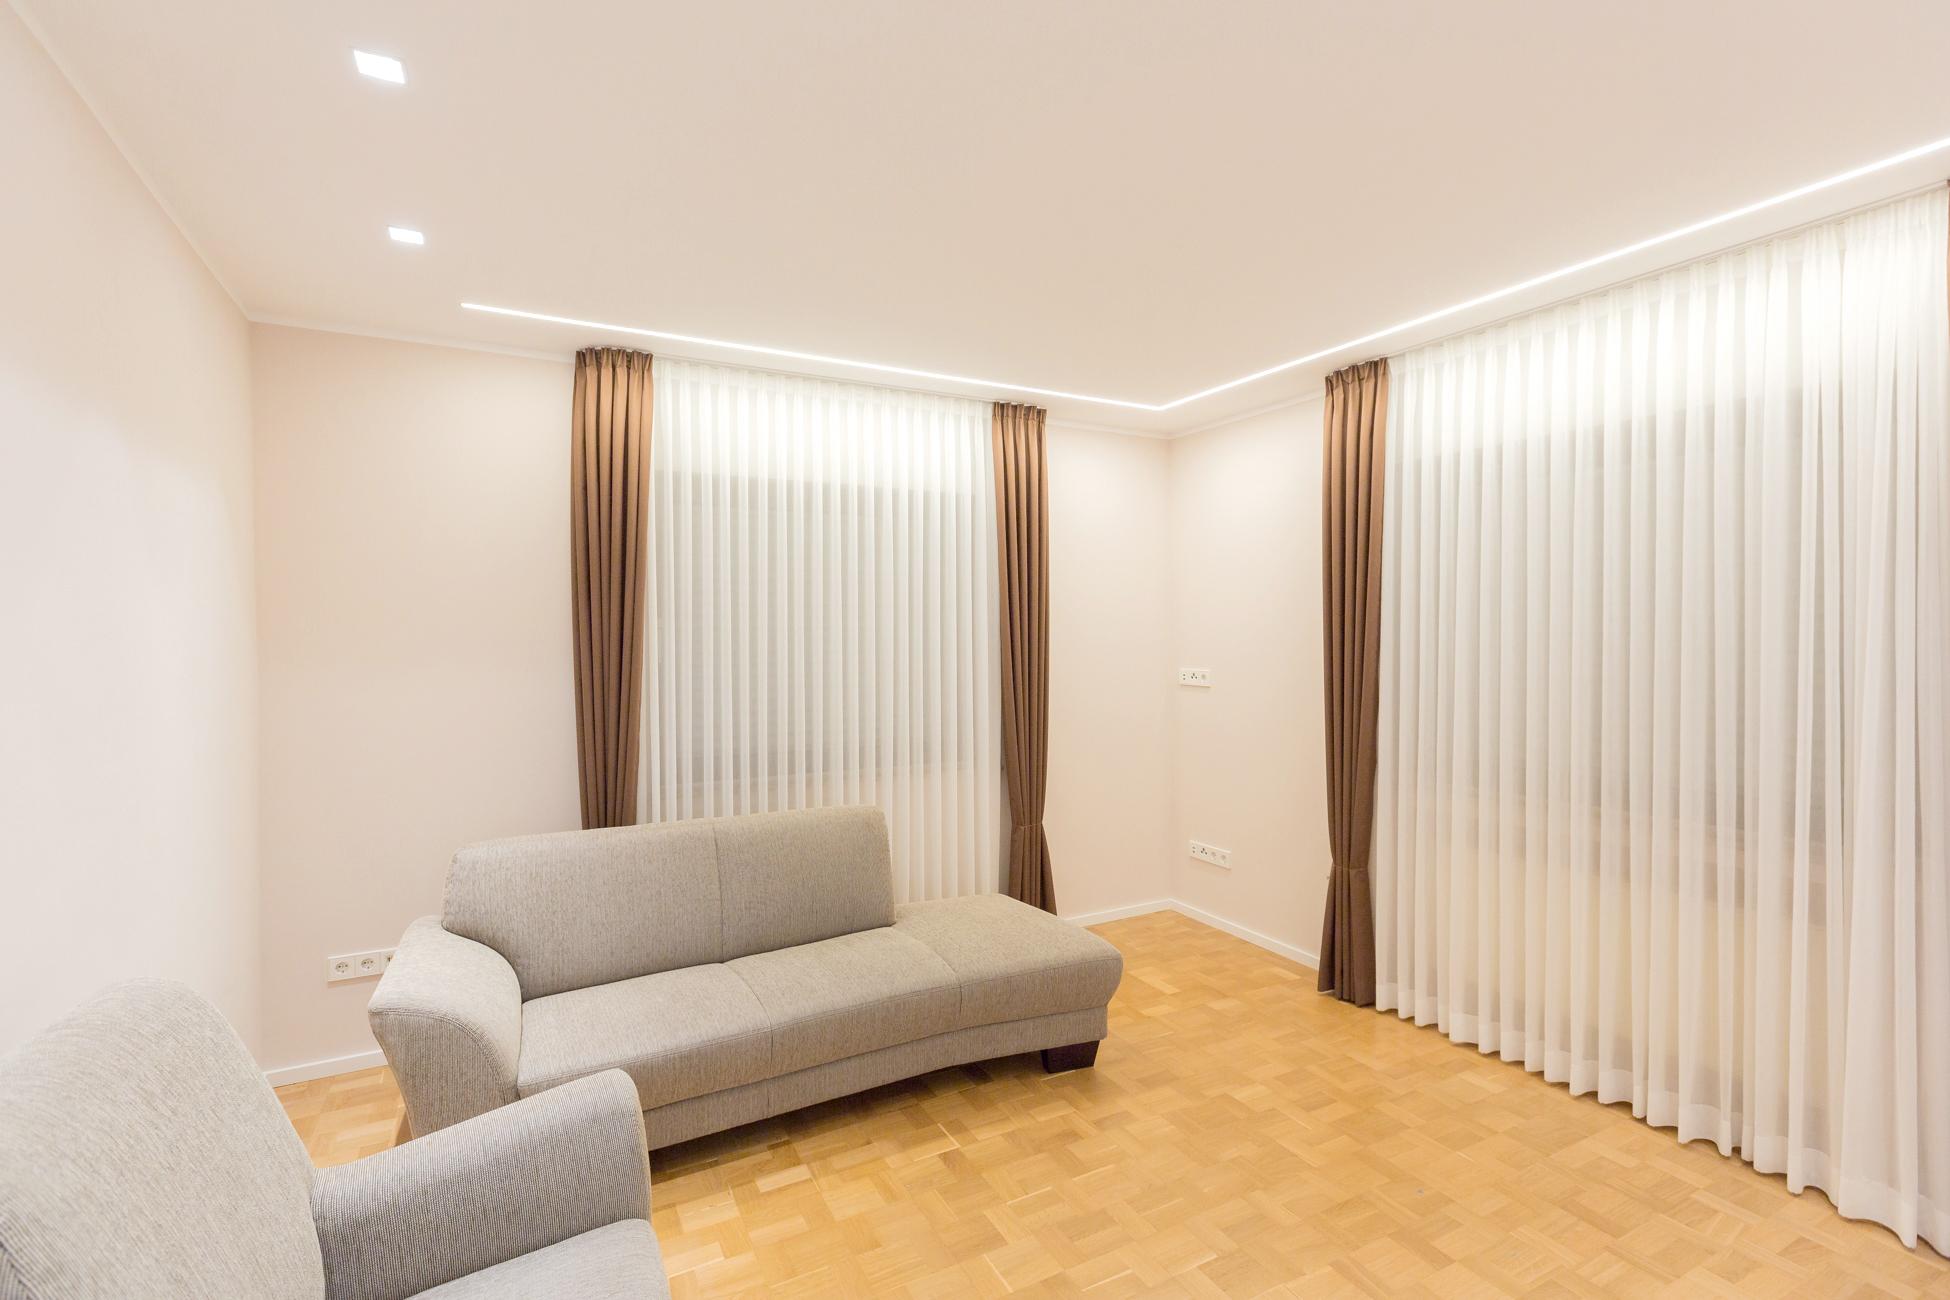 LED Beleuchtung Wohnzimmer